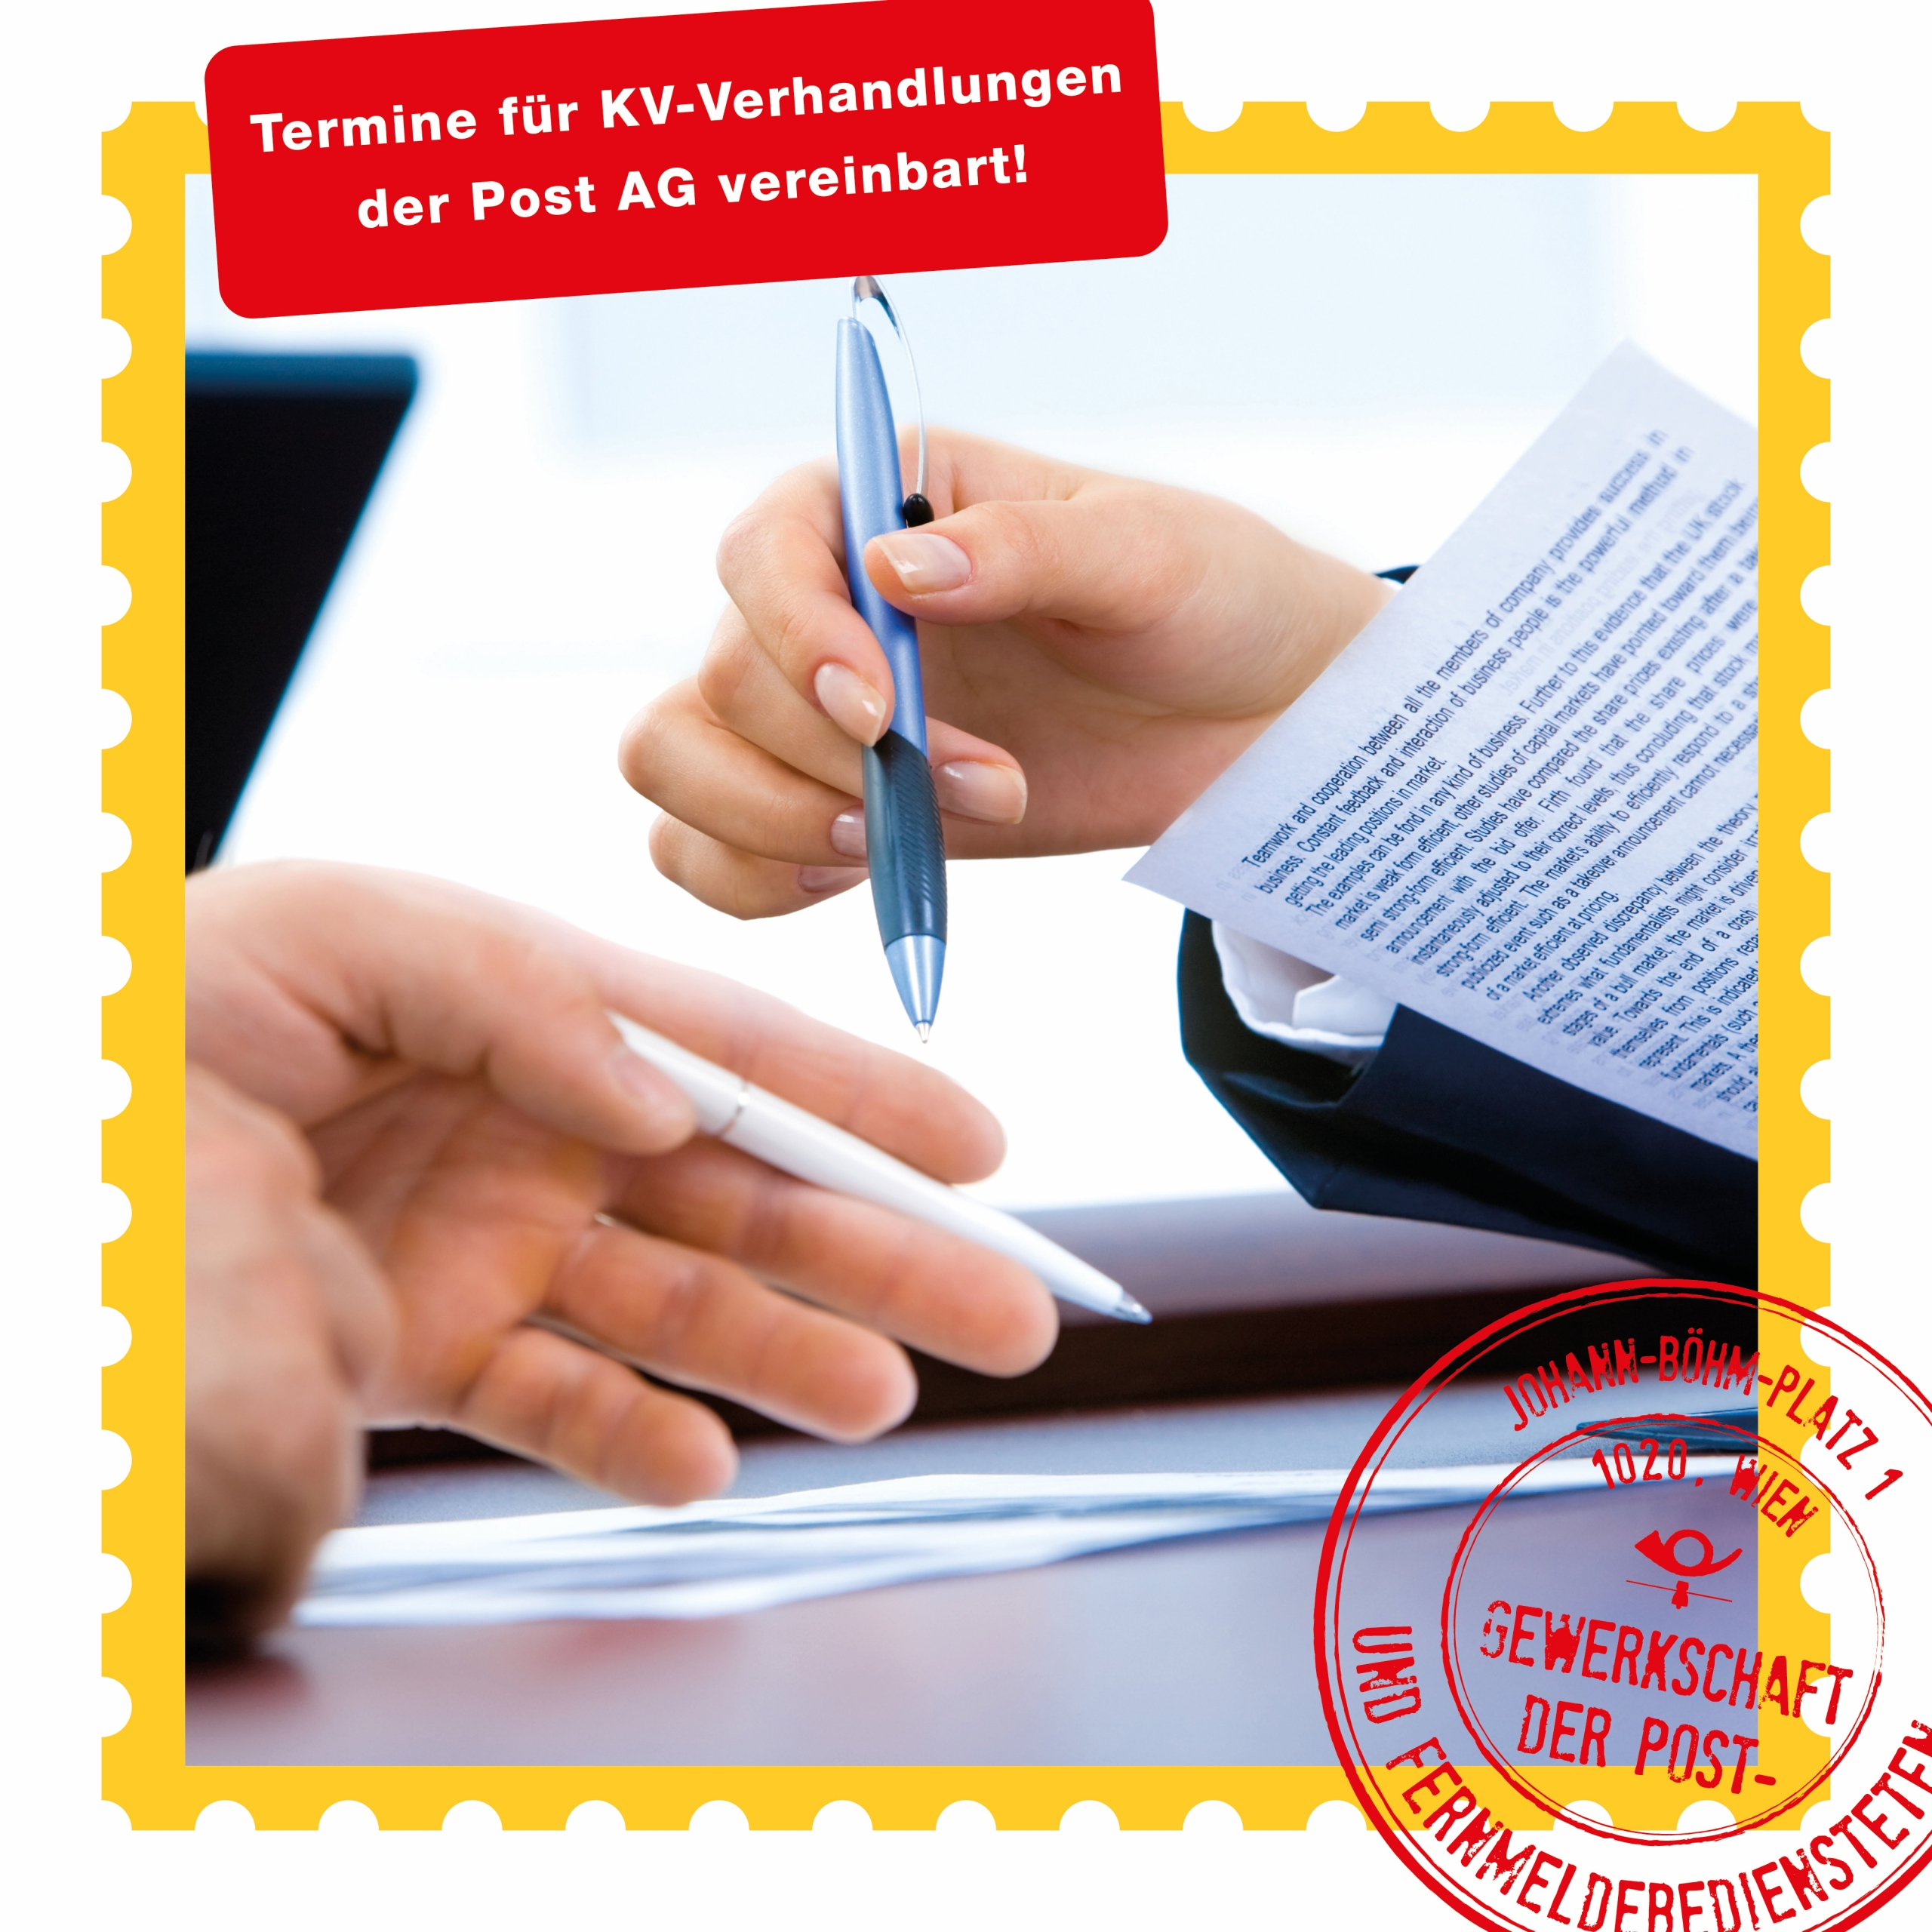 KV Verhandlungen Post AG_Beitragsbild